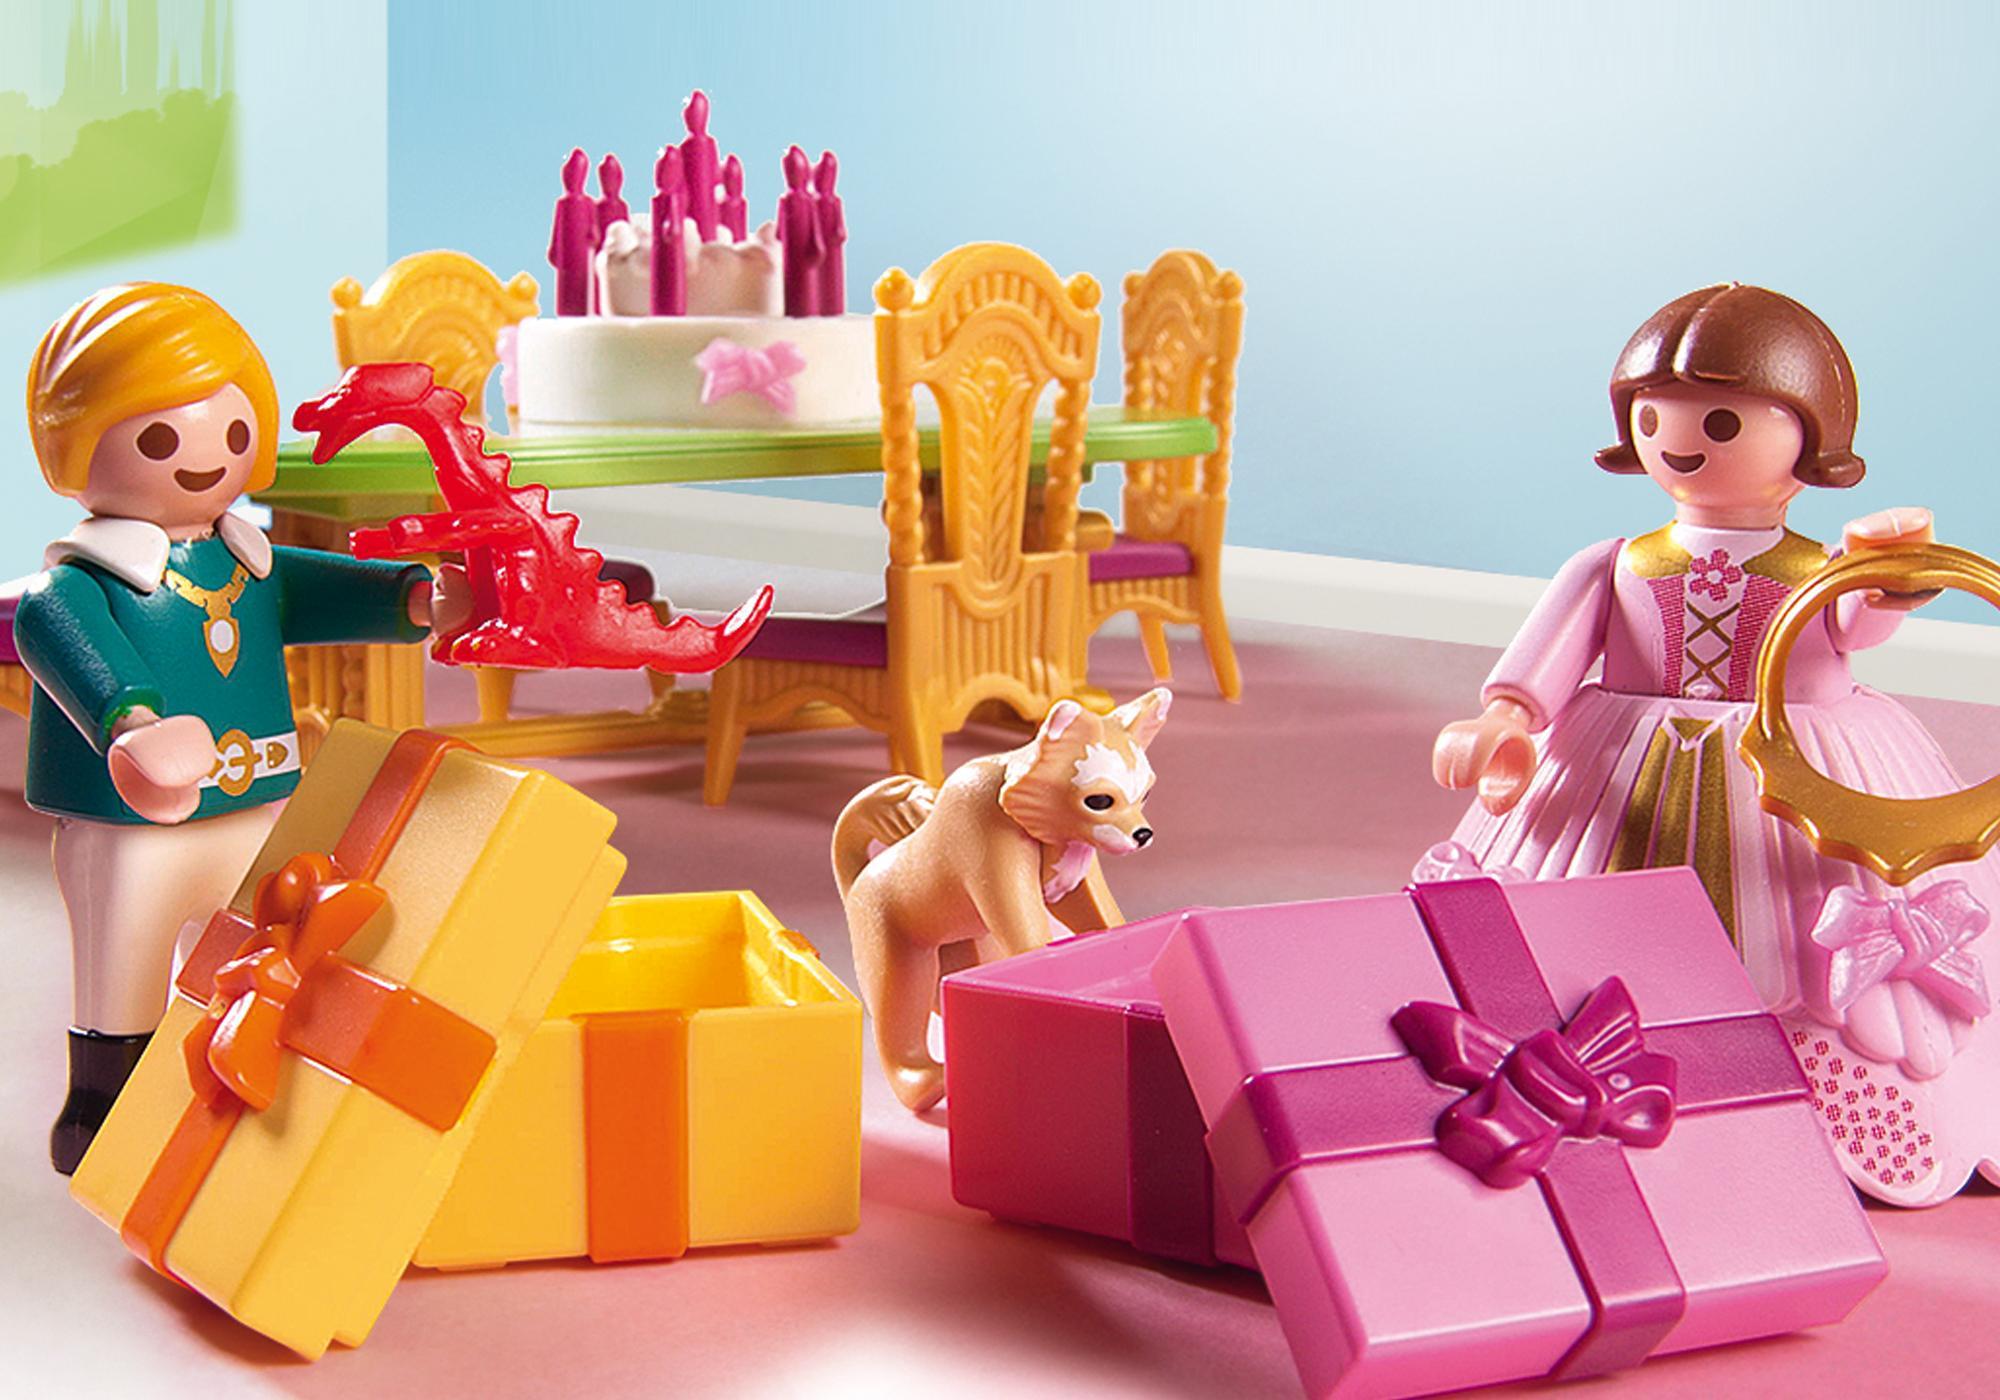 http://media.playmobil.com/i/playmobil/6854_product_extra2